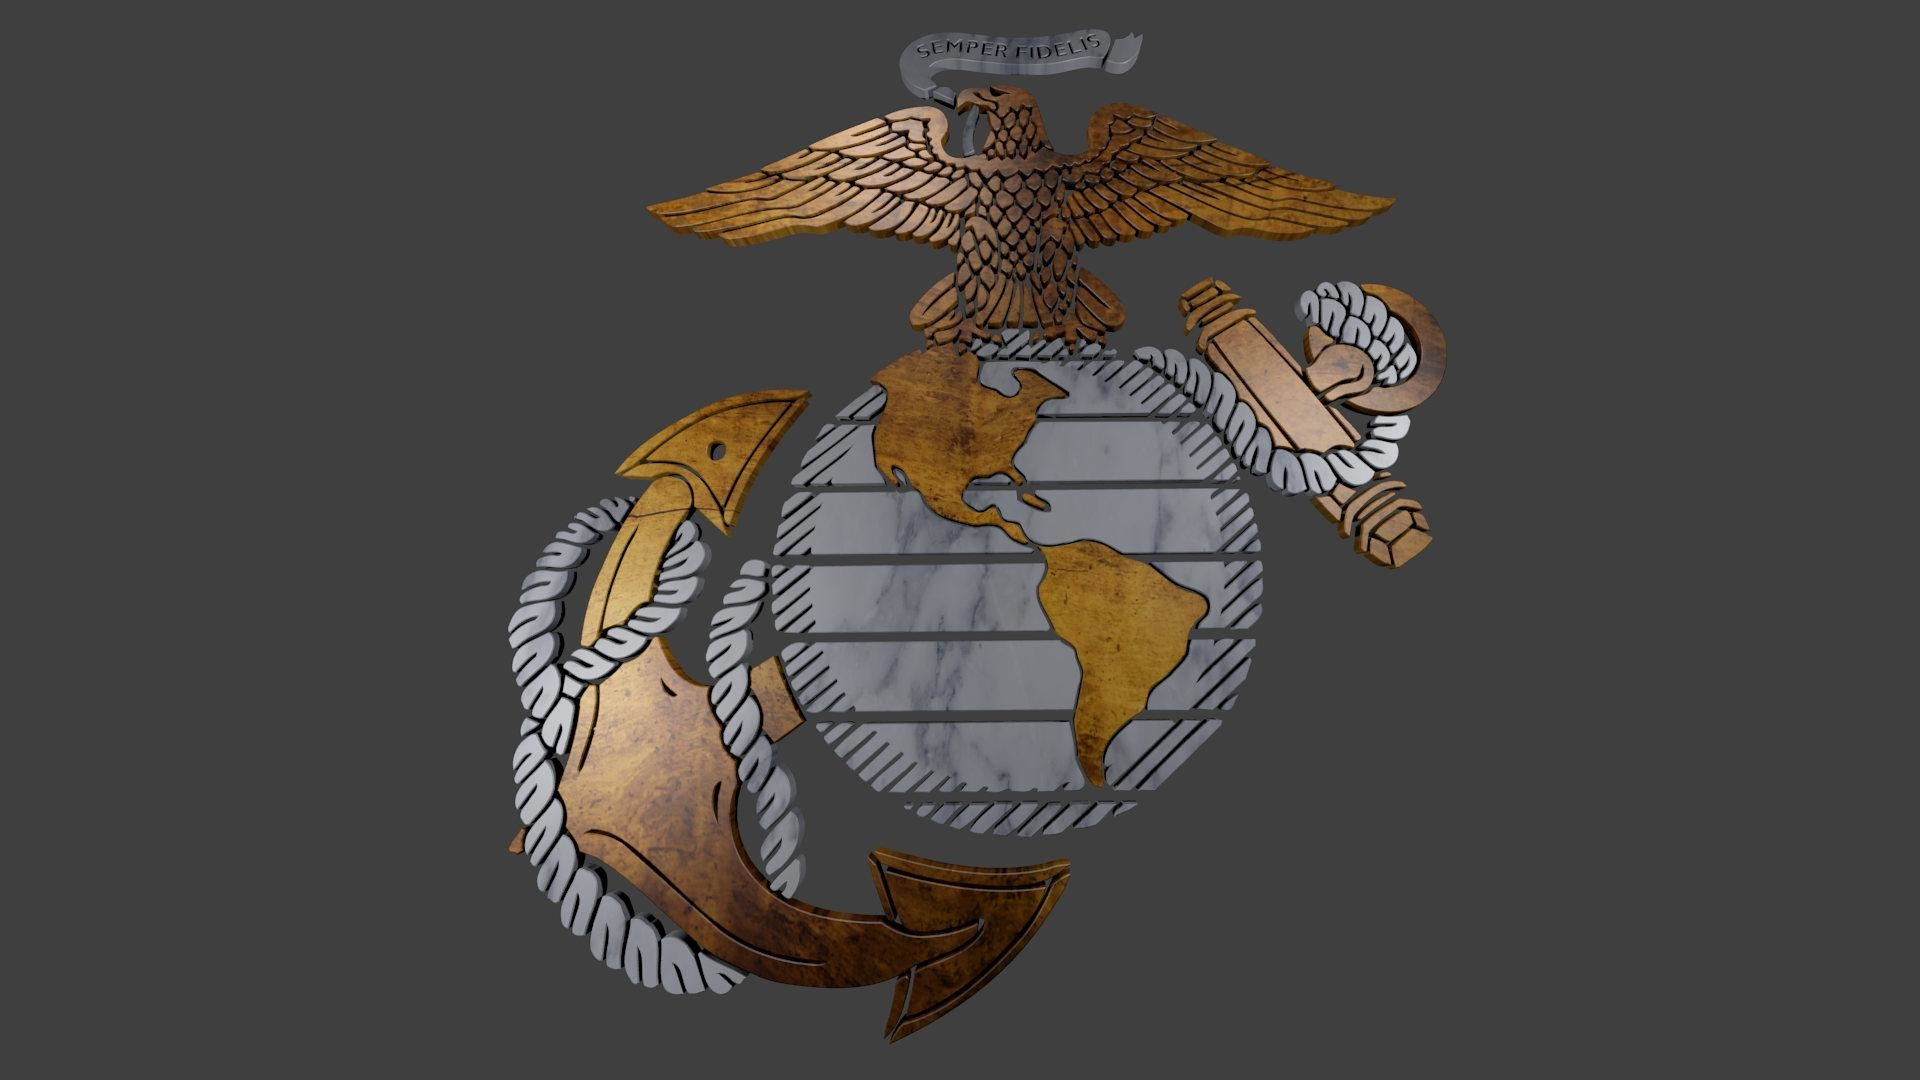 Logo-USMC-wallpapers-HD – Logo USMC wallpapers HD